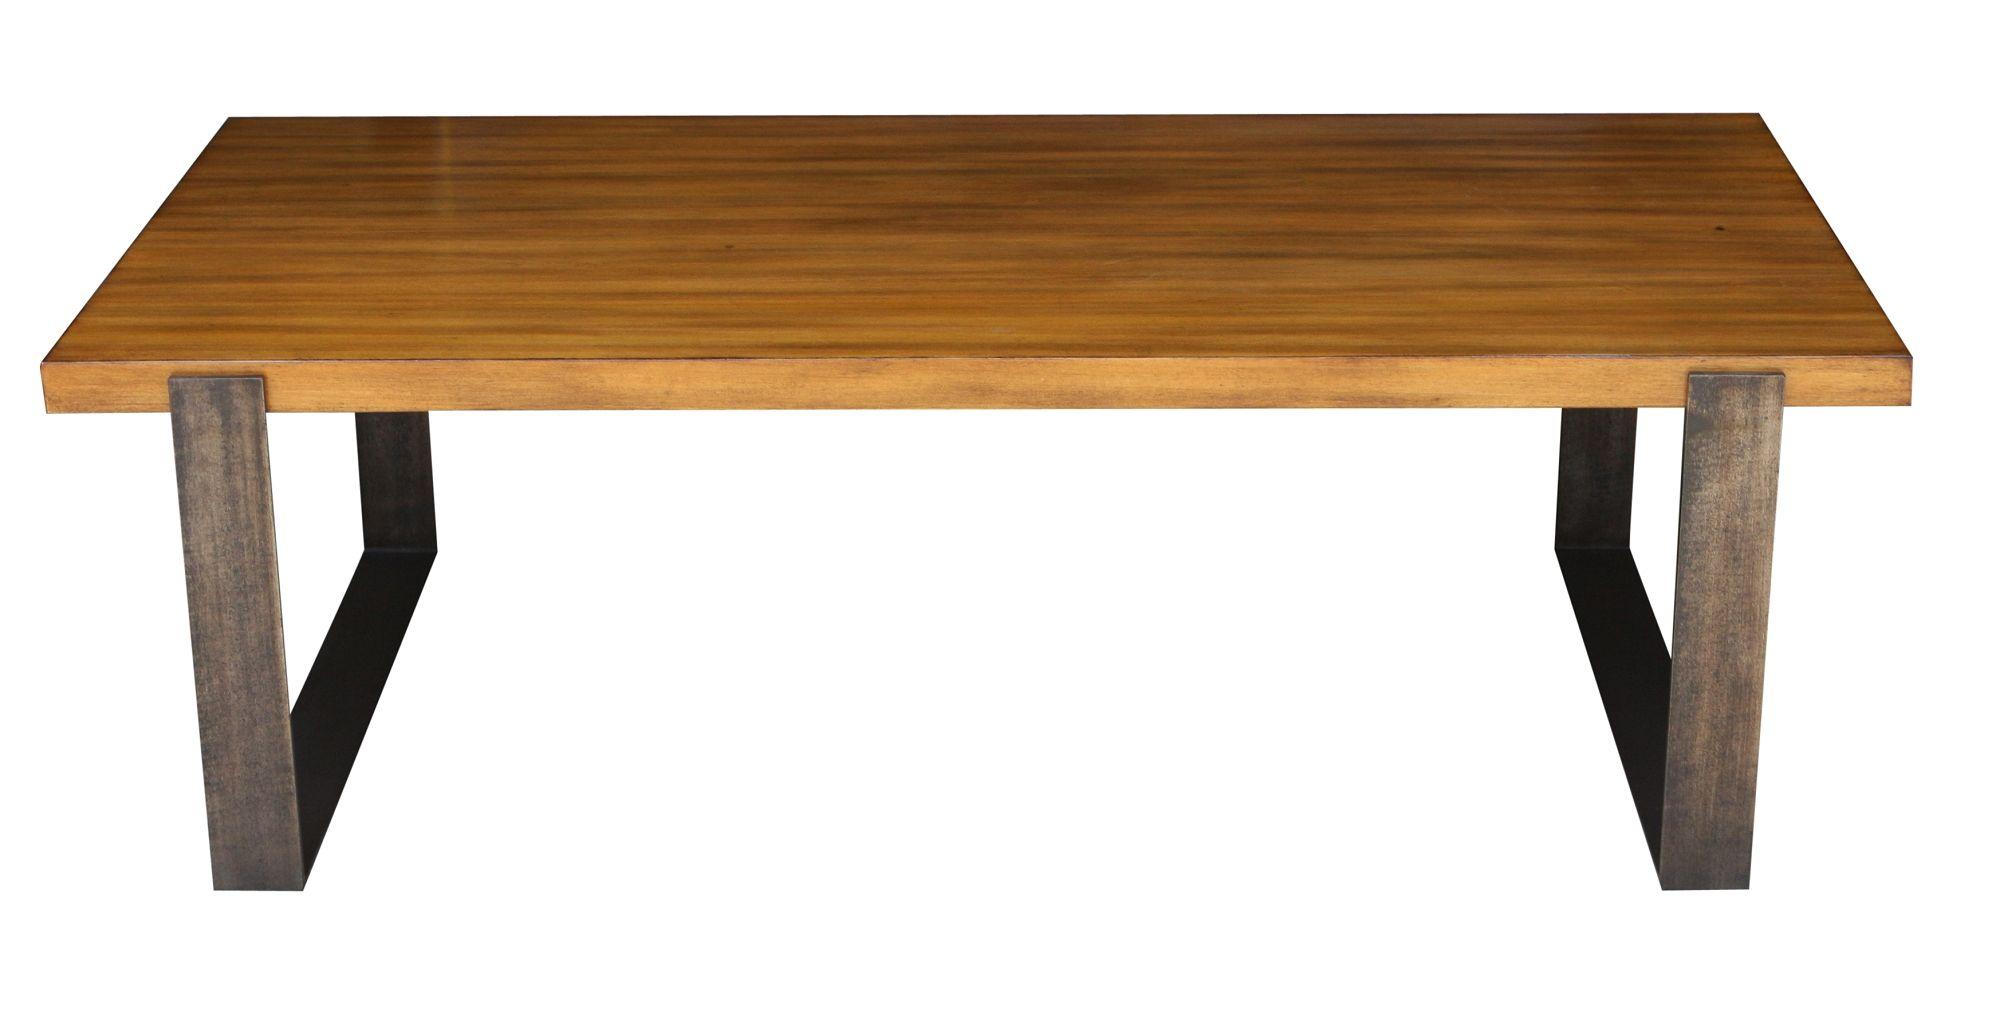 Modern Metal and Wood Coffee Table